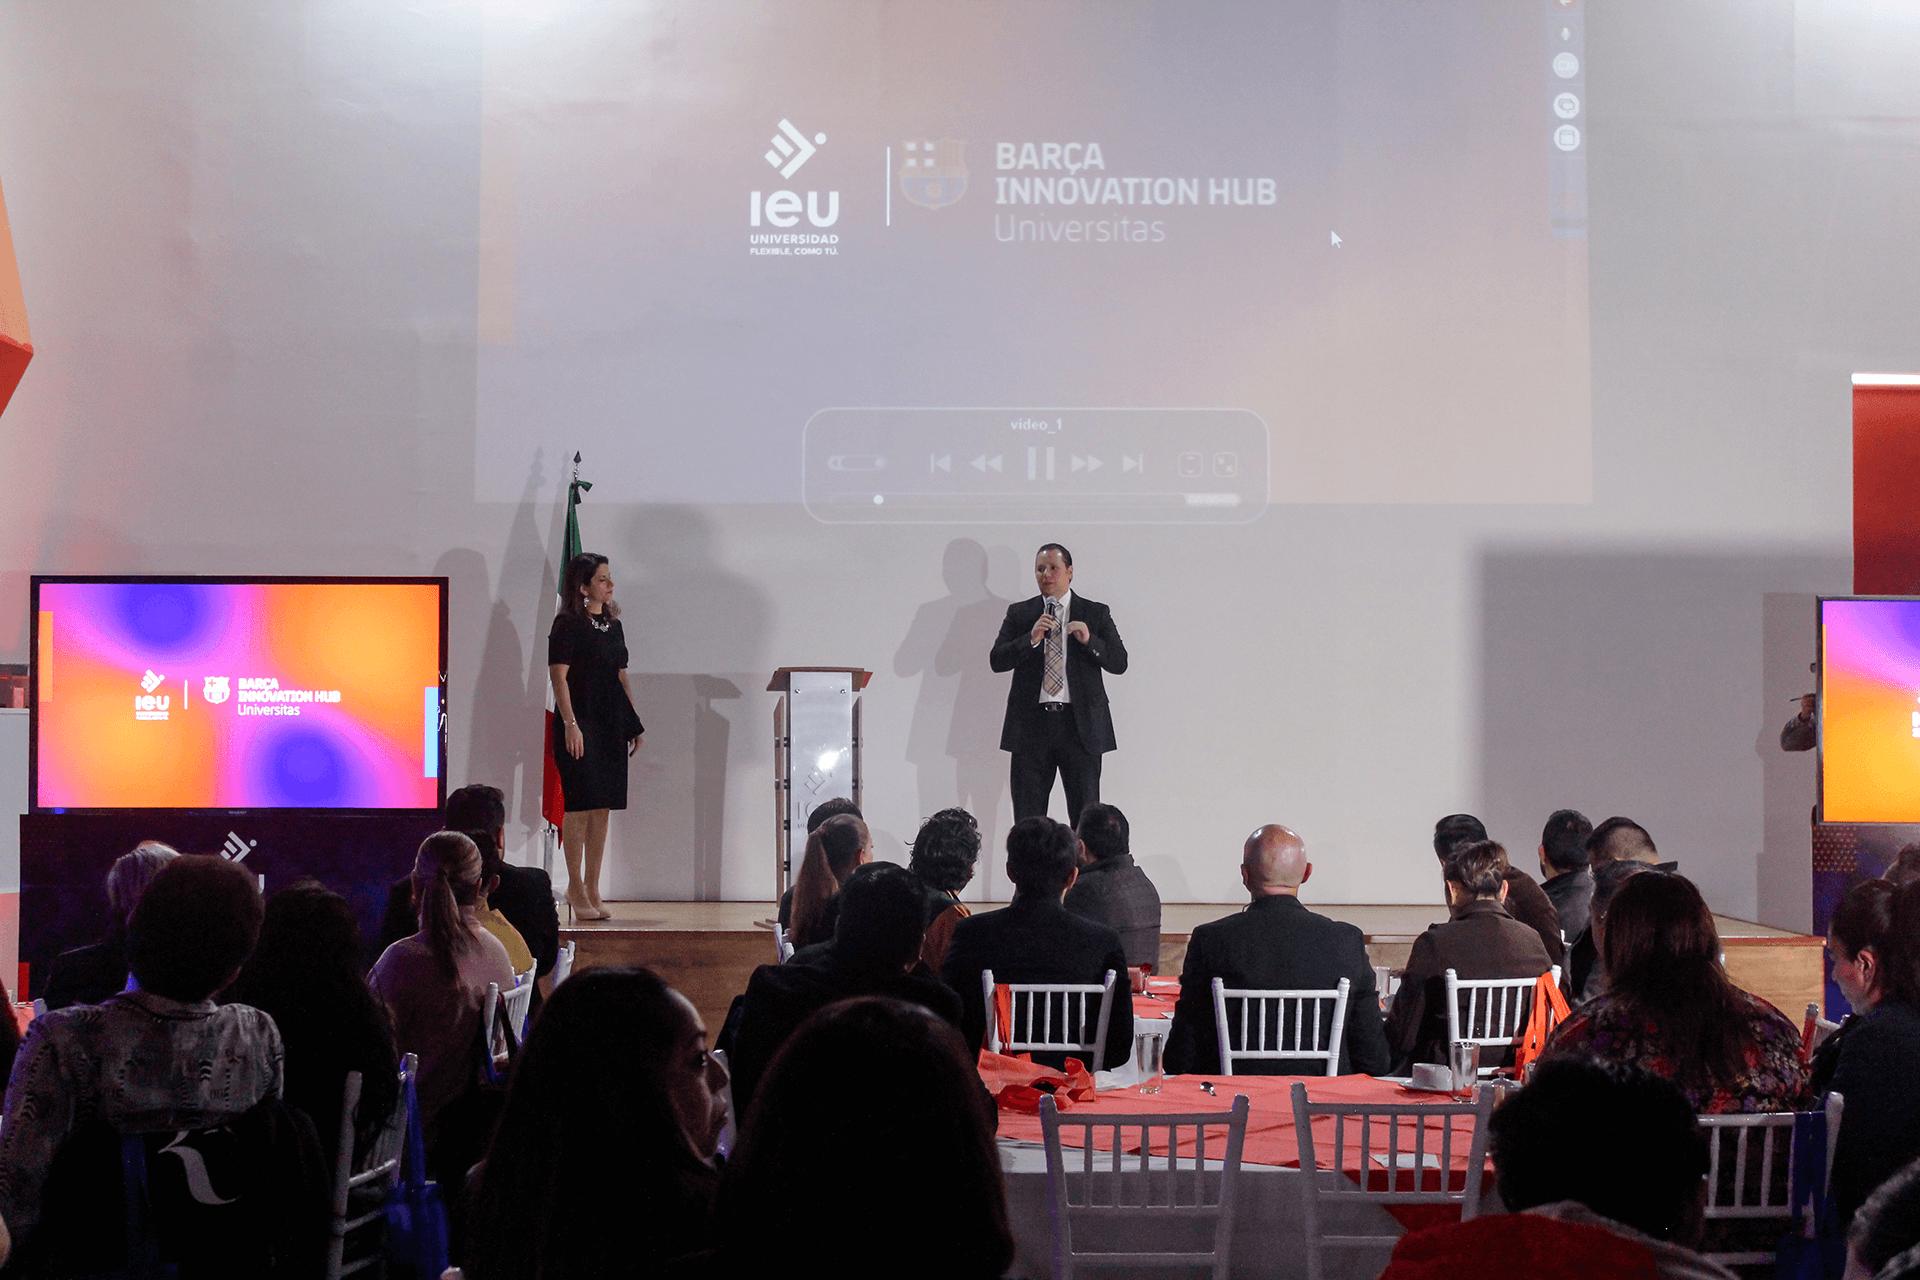 Universidad Ieu Alianza Exclusiva Con Barça Innovation Hub 03